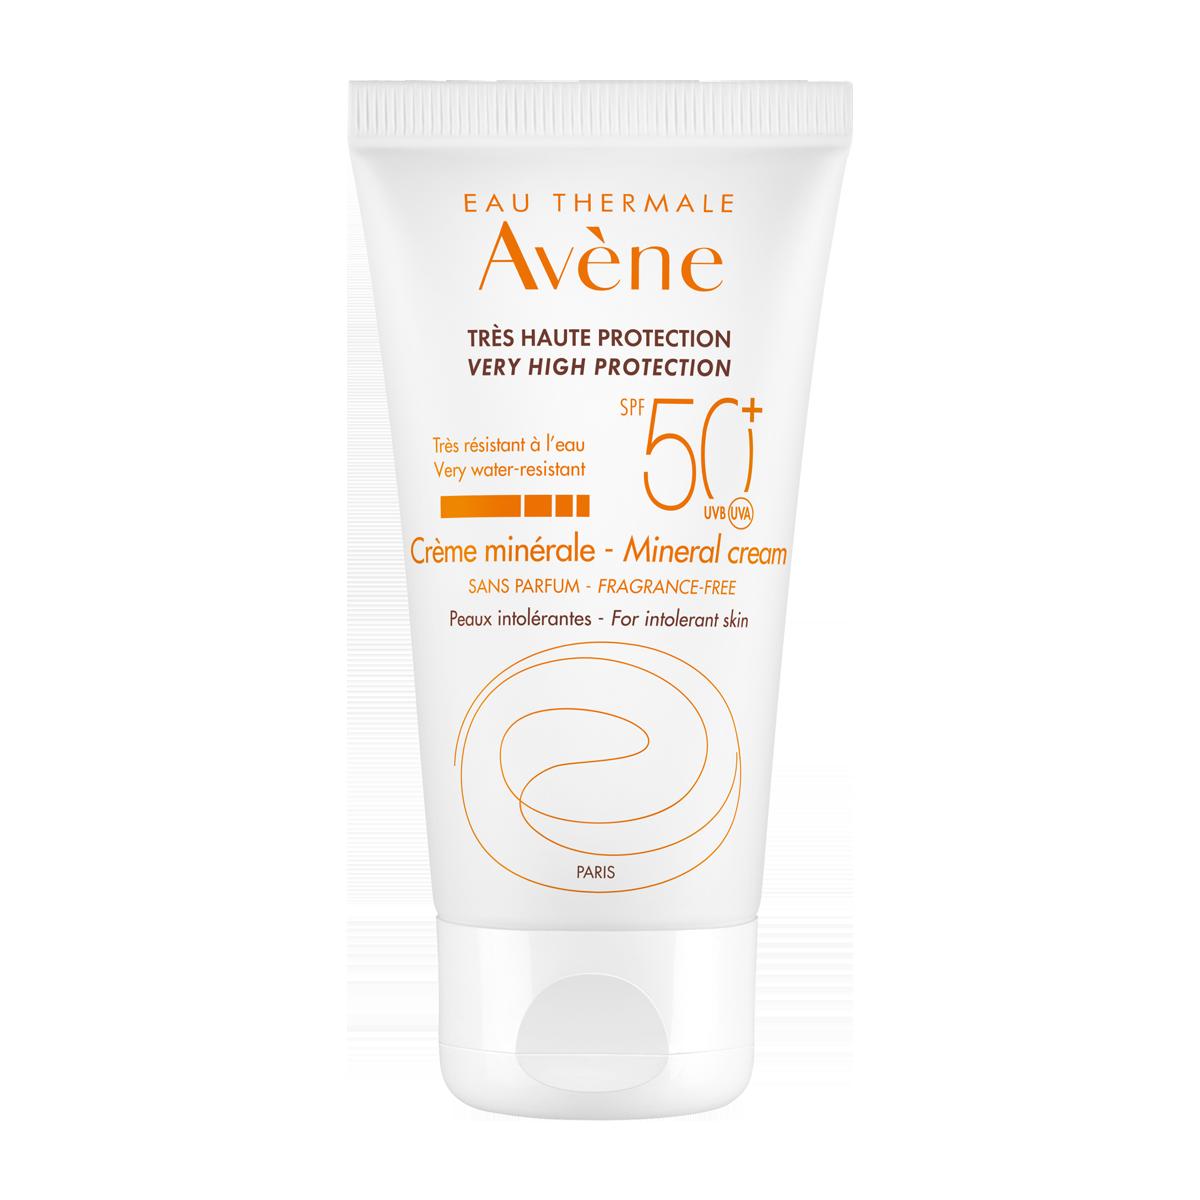 Eau Thermale Avène Sonnencreme SPF50+ mineralisch